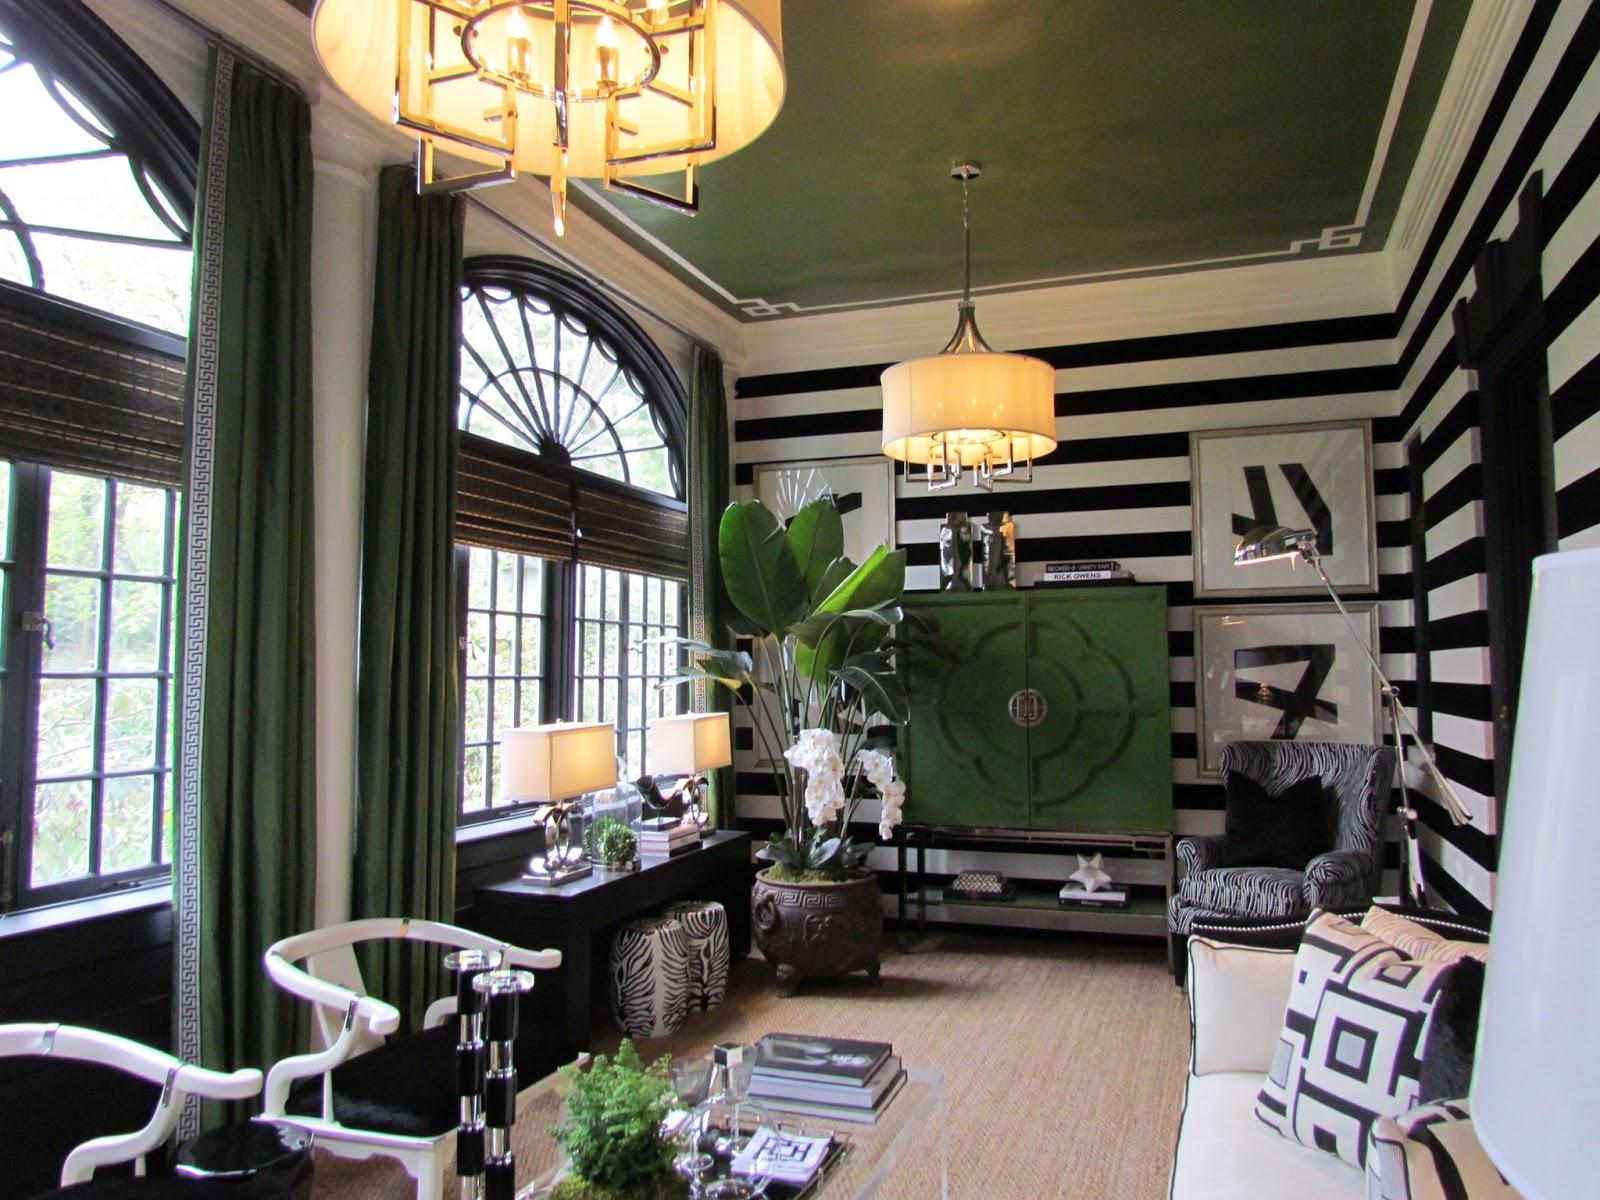 Dec a porter imagination home the designer showhouse of westchester part 2